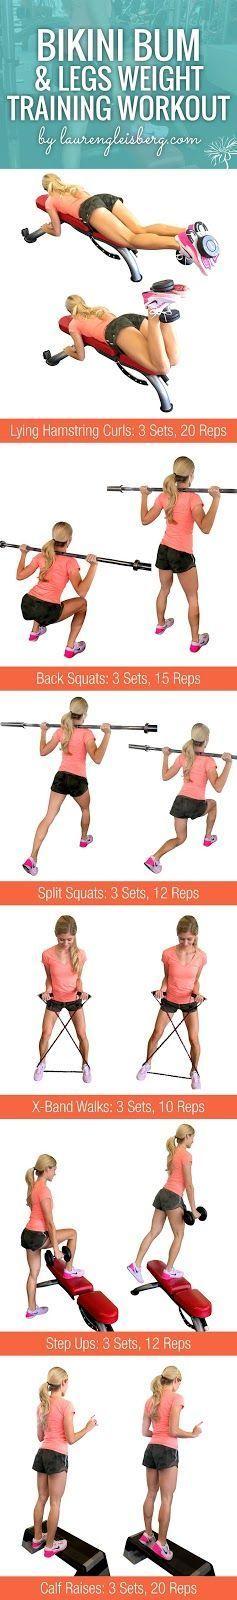 nice Legs & Glutes (ConfidenceKini Challenge) - 4/23   Lauren Gleisberg   Happiness, Health, & Fitness